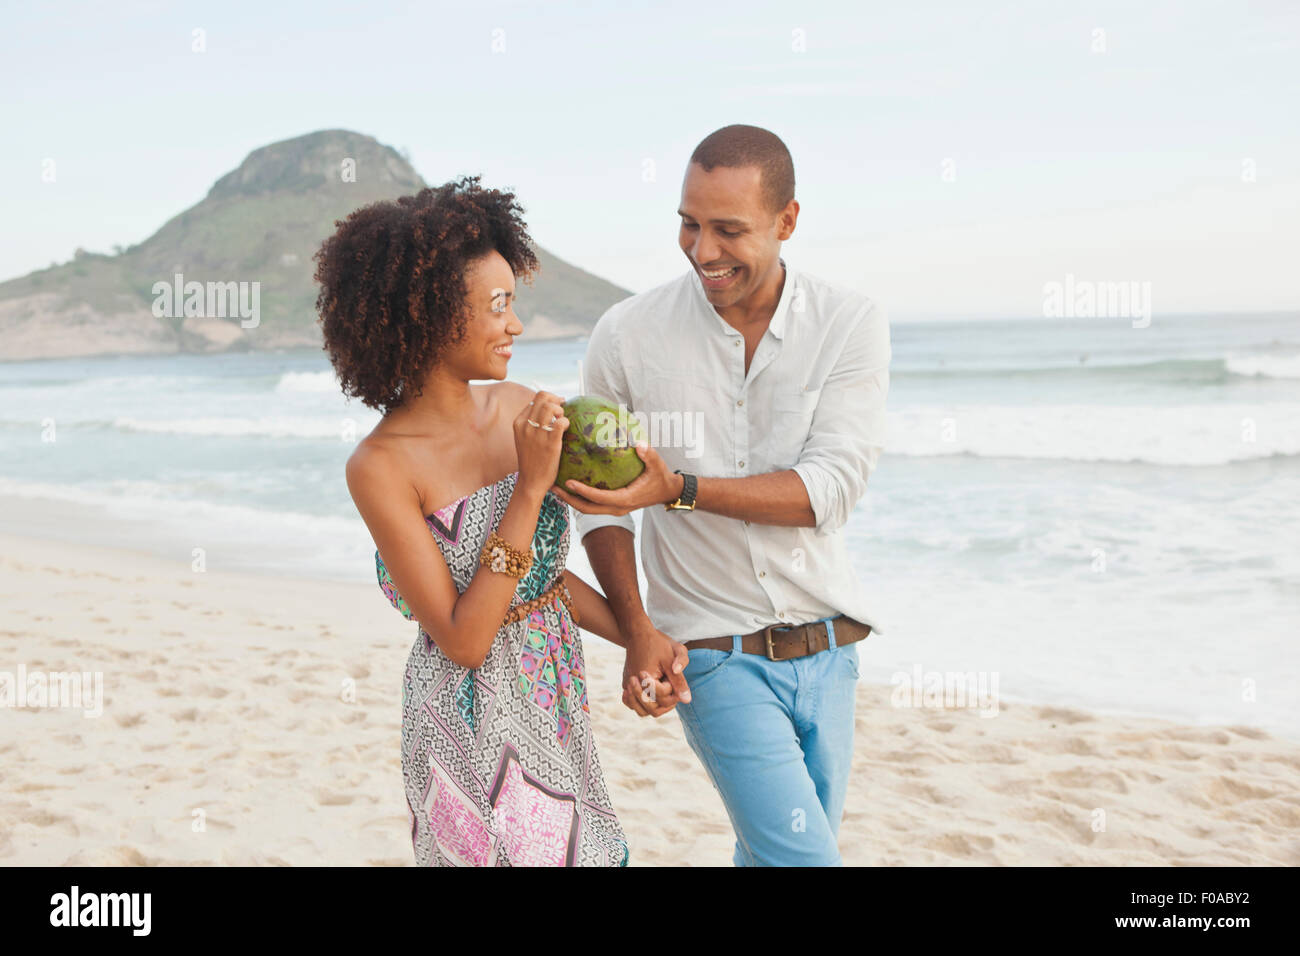 Couple drinking coconut milk on beach, Rio De Janeiro, Brazil - Stock Image